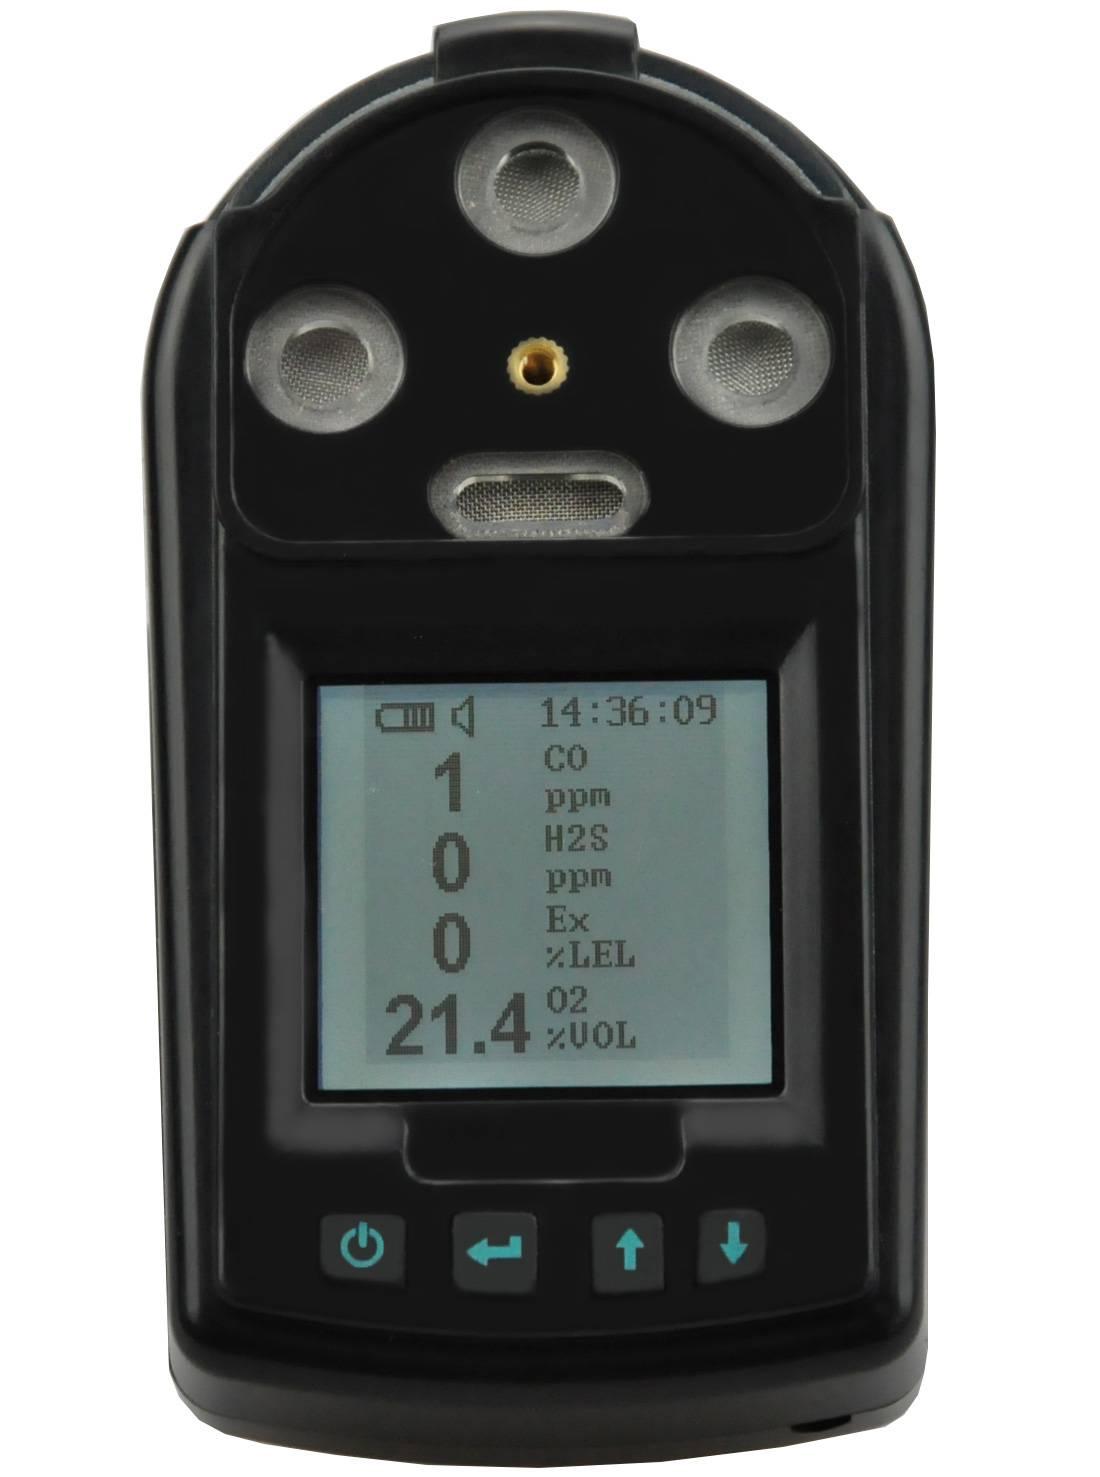 Portable gas detector   RH-1600